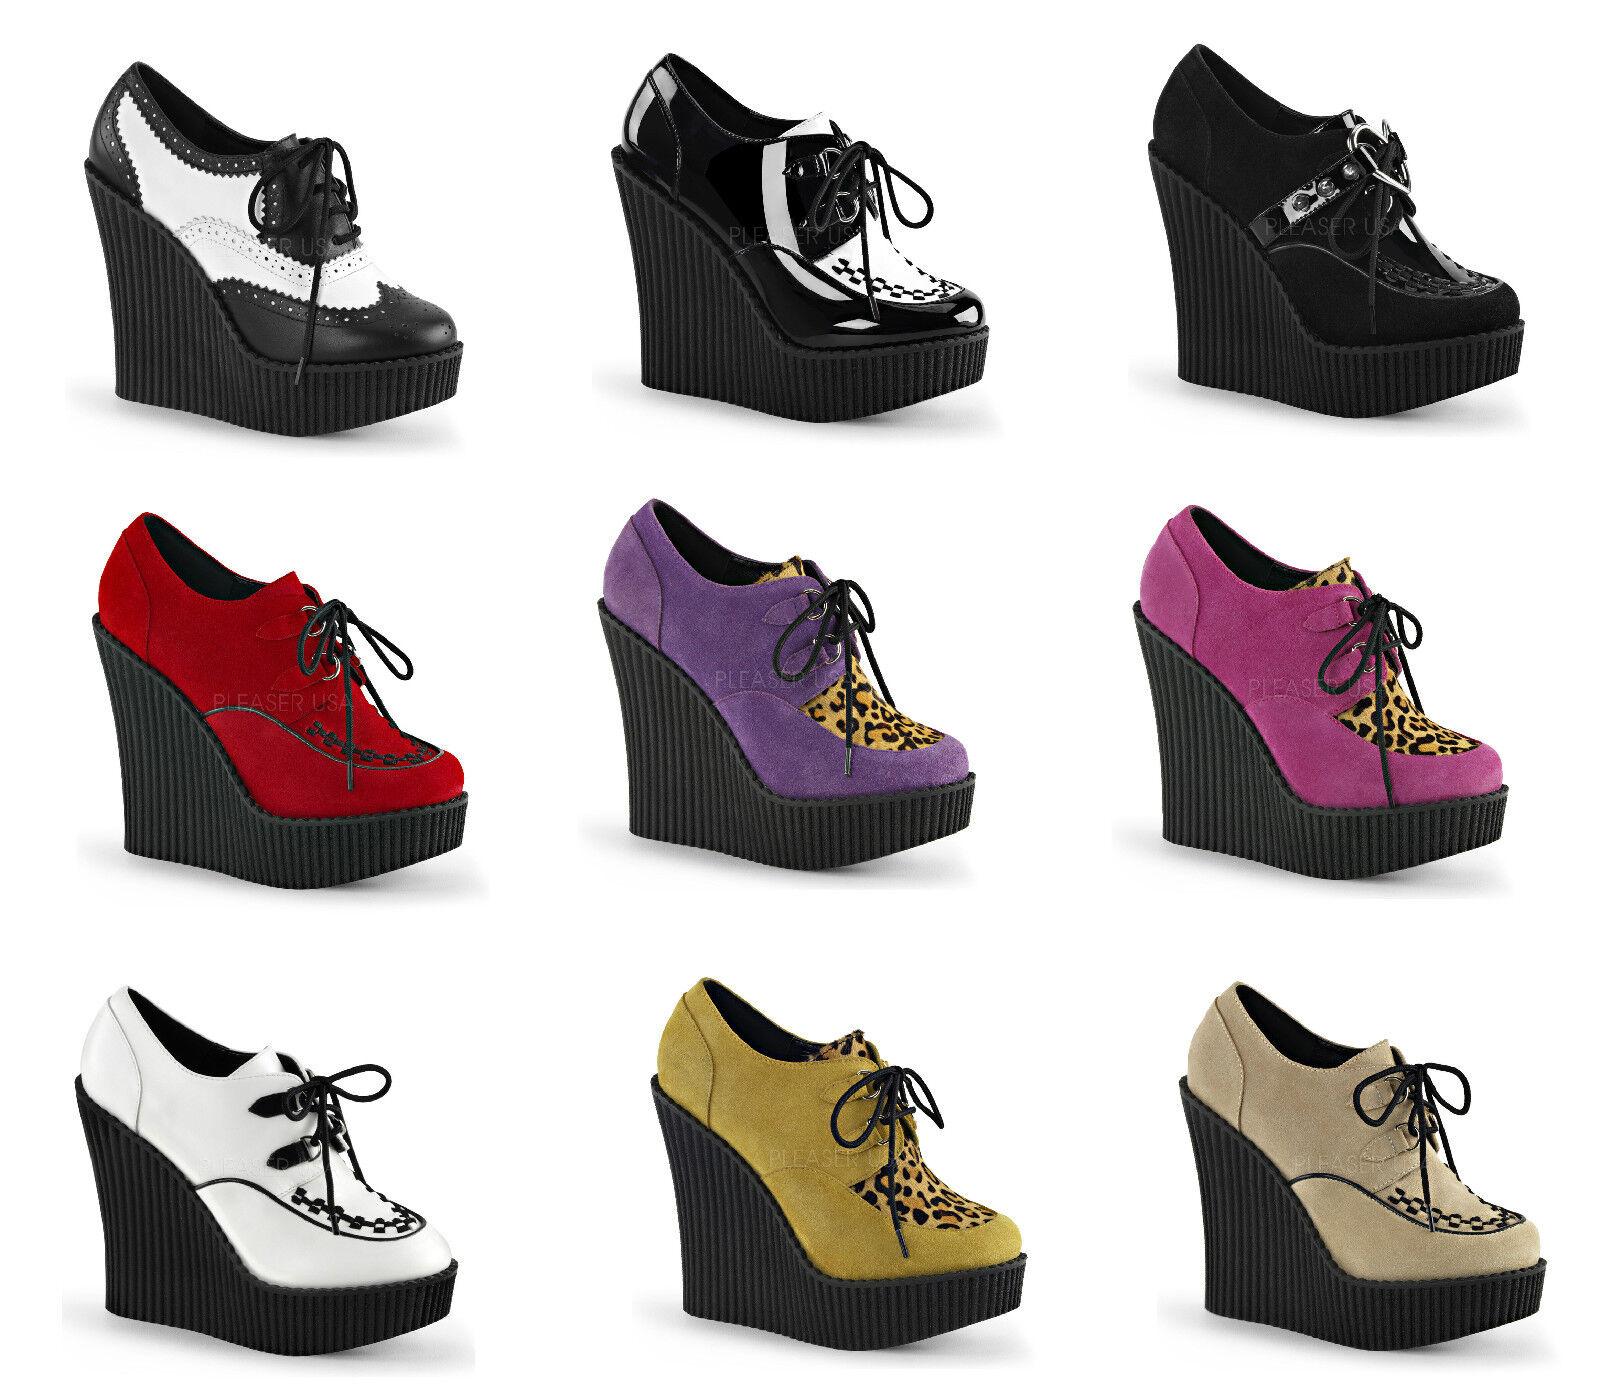 Demonia CREEPER-302 304 306 307 Women's Platform Wedges